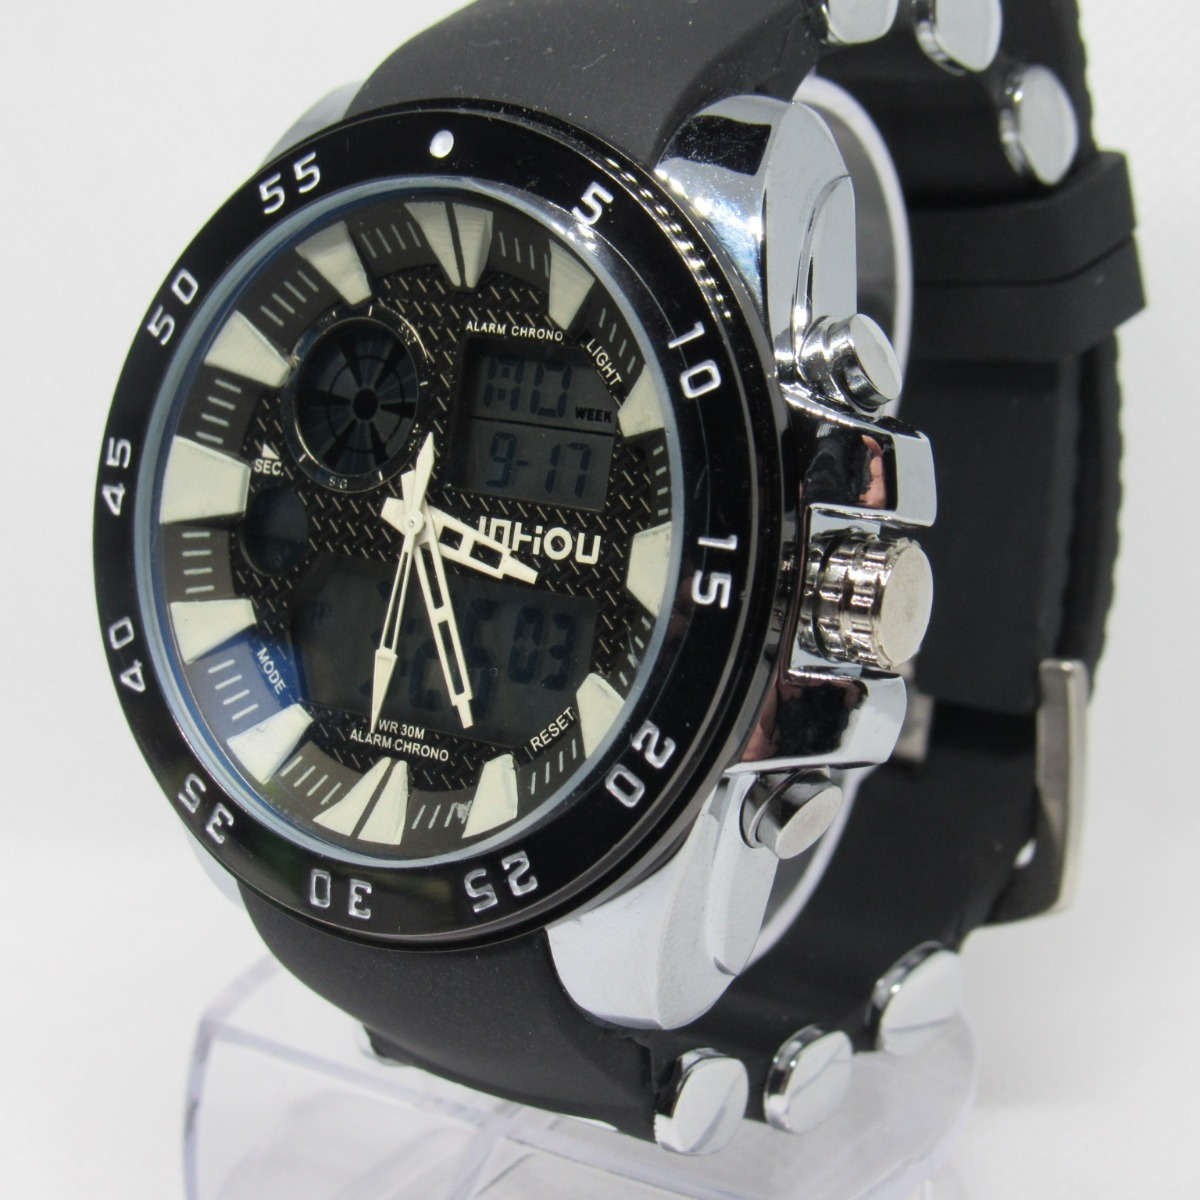 29db0903918 Relógio Inhou 8012 Shock Militar Moderno Esporte Prova Dagua - R  79 ...